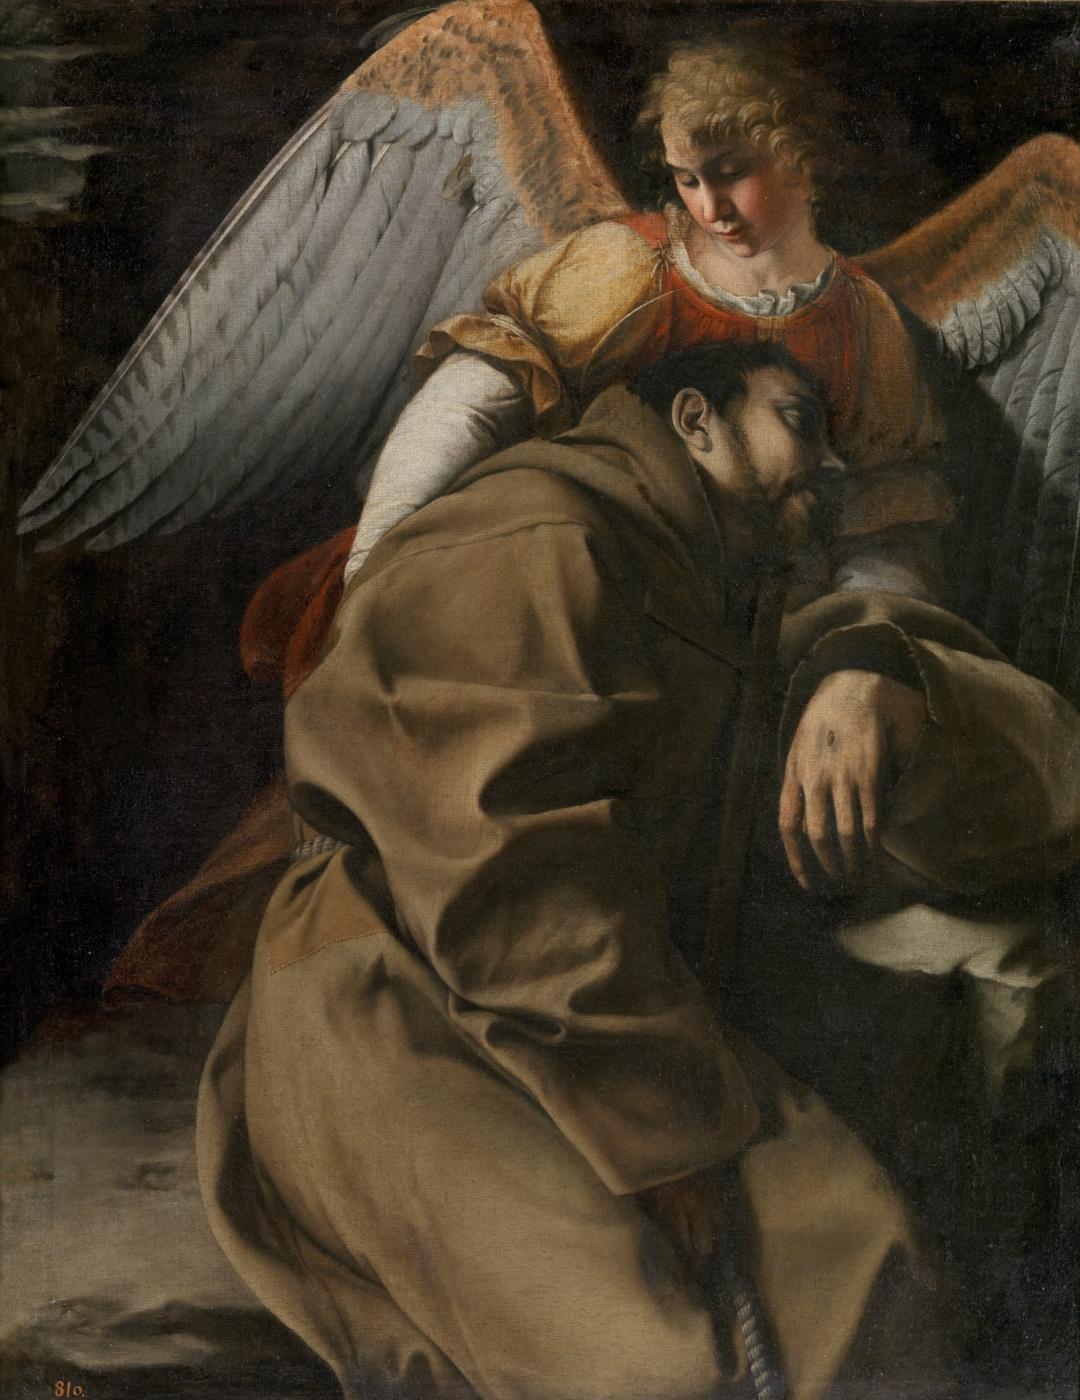 Orazio Gentileski. Saint Francis supported by an Angel